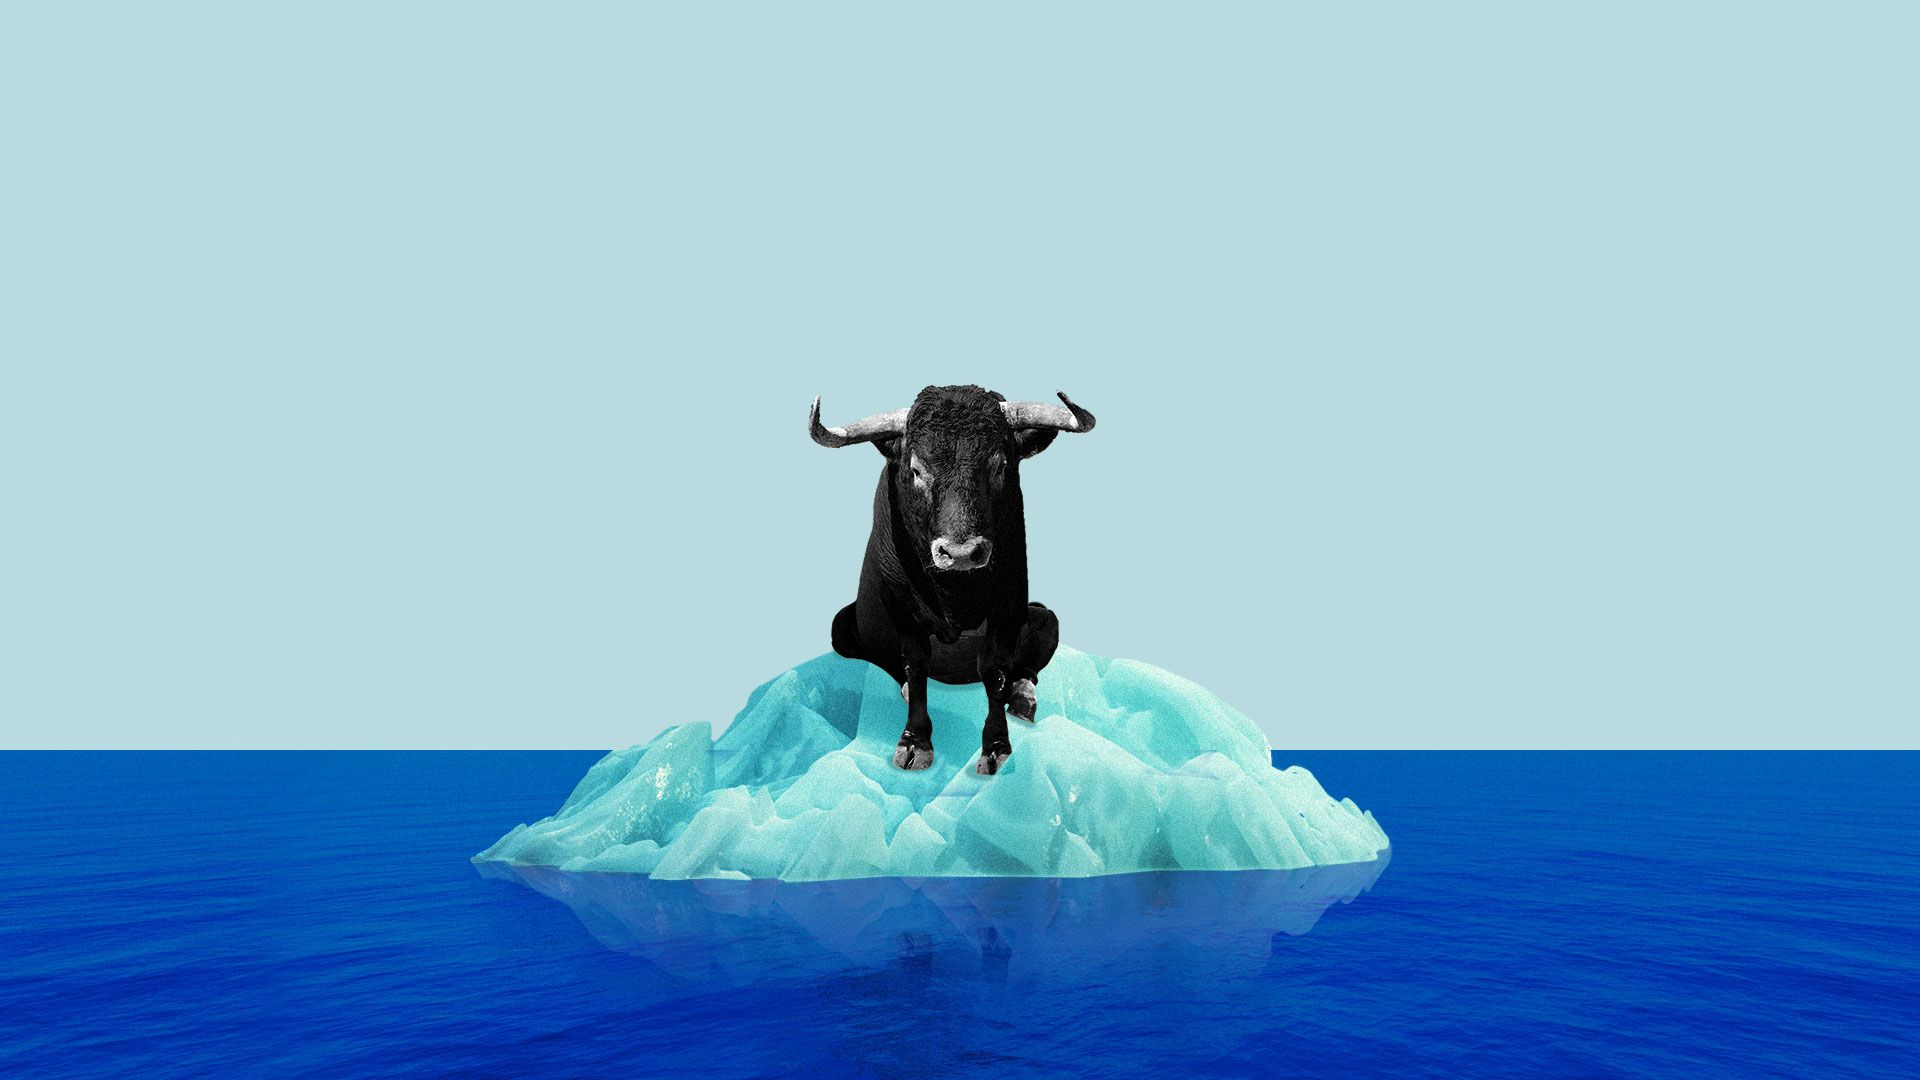 bull on an iceberg